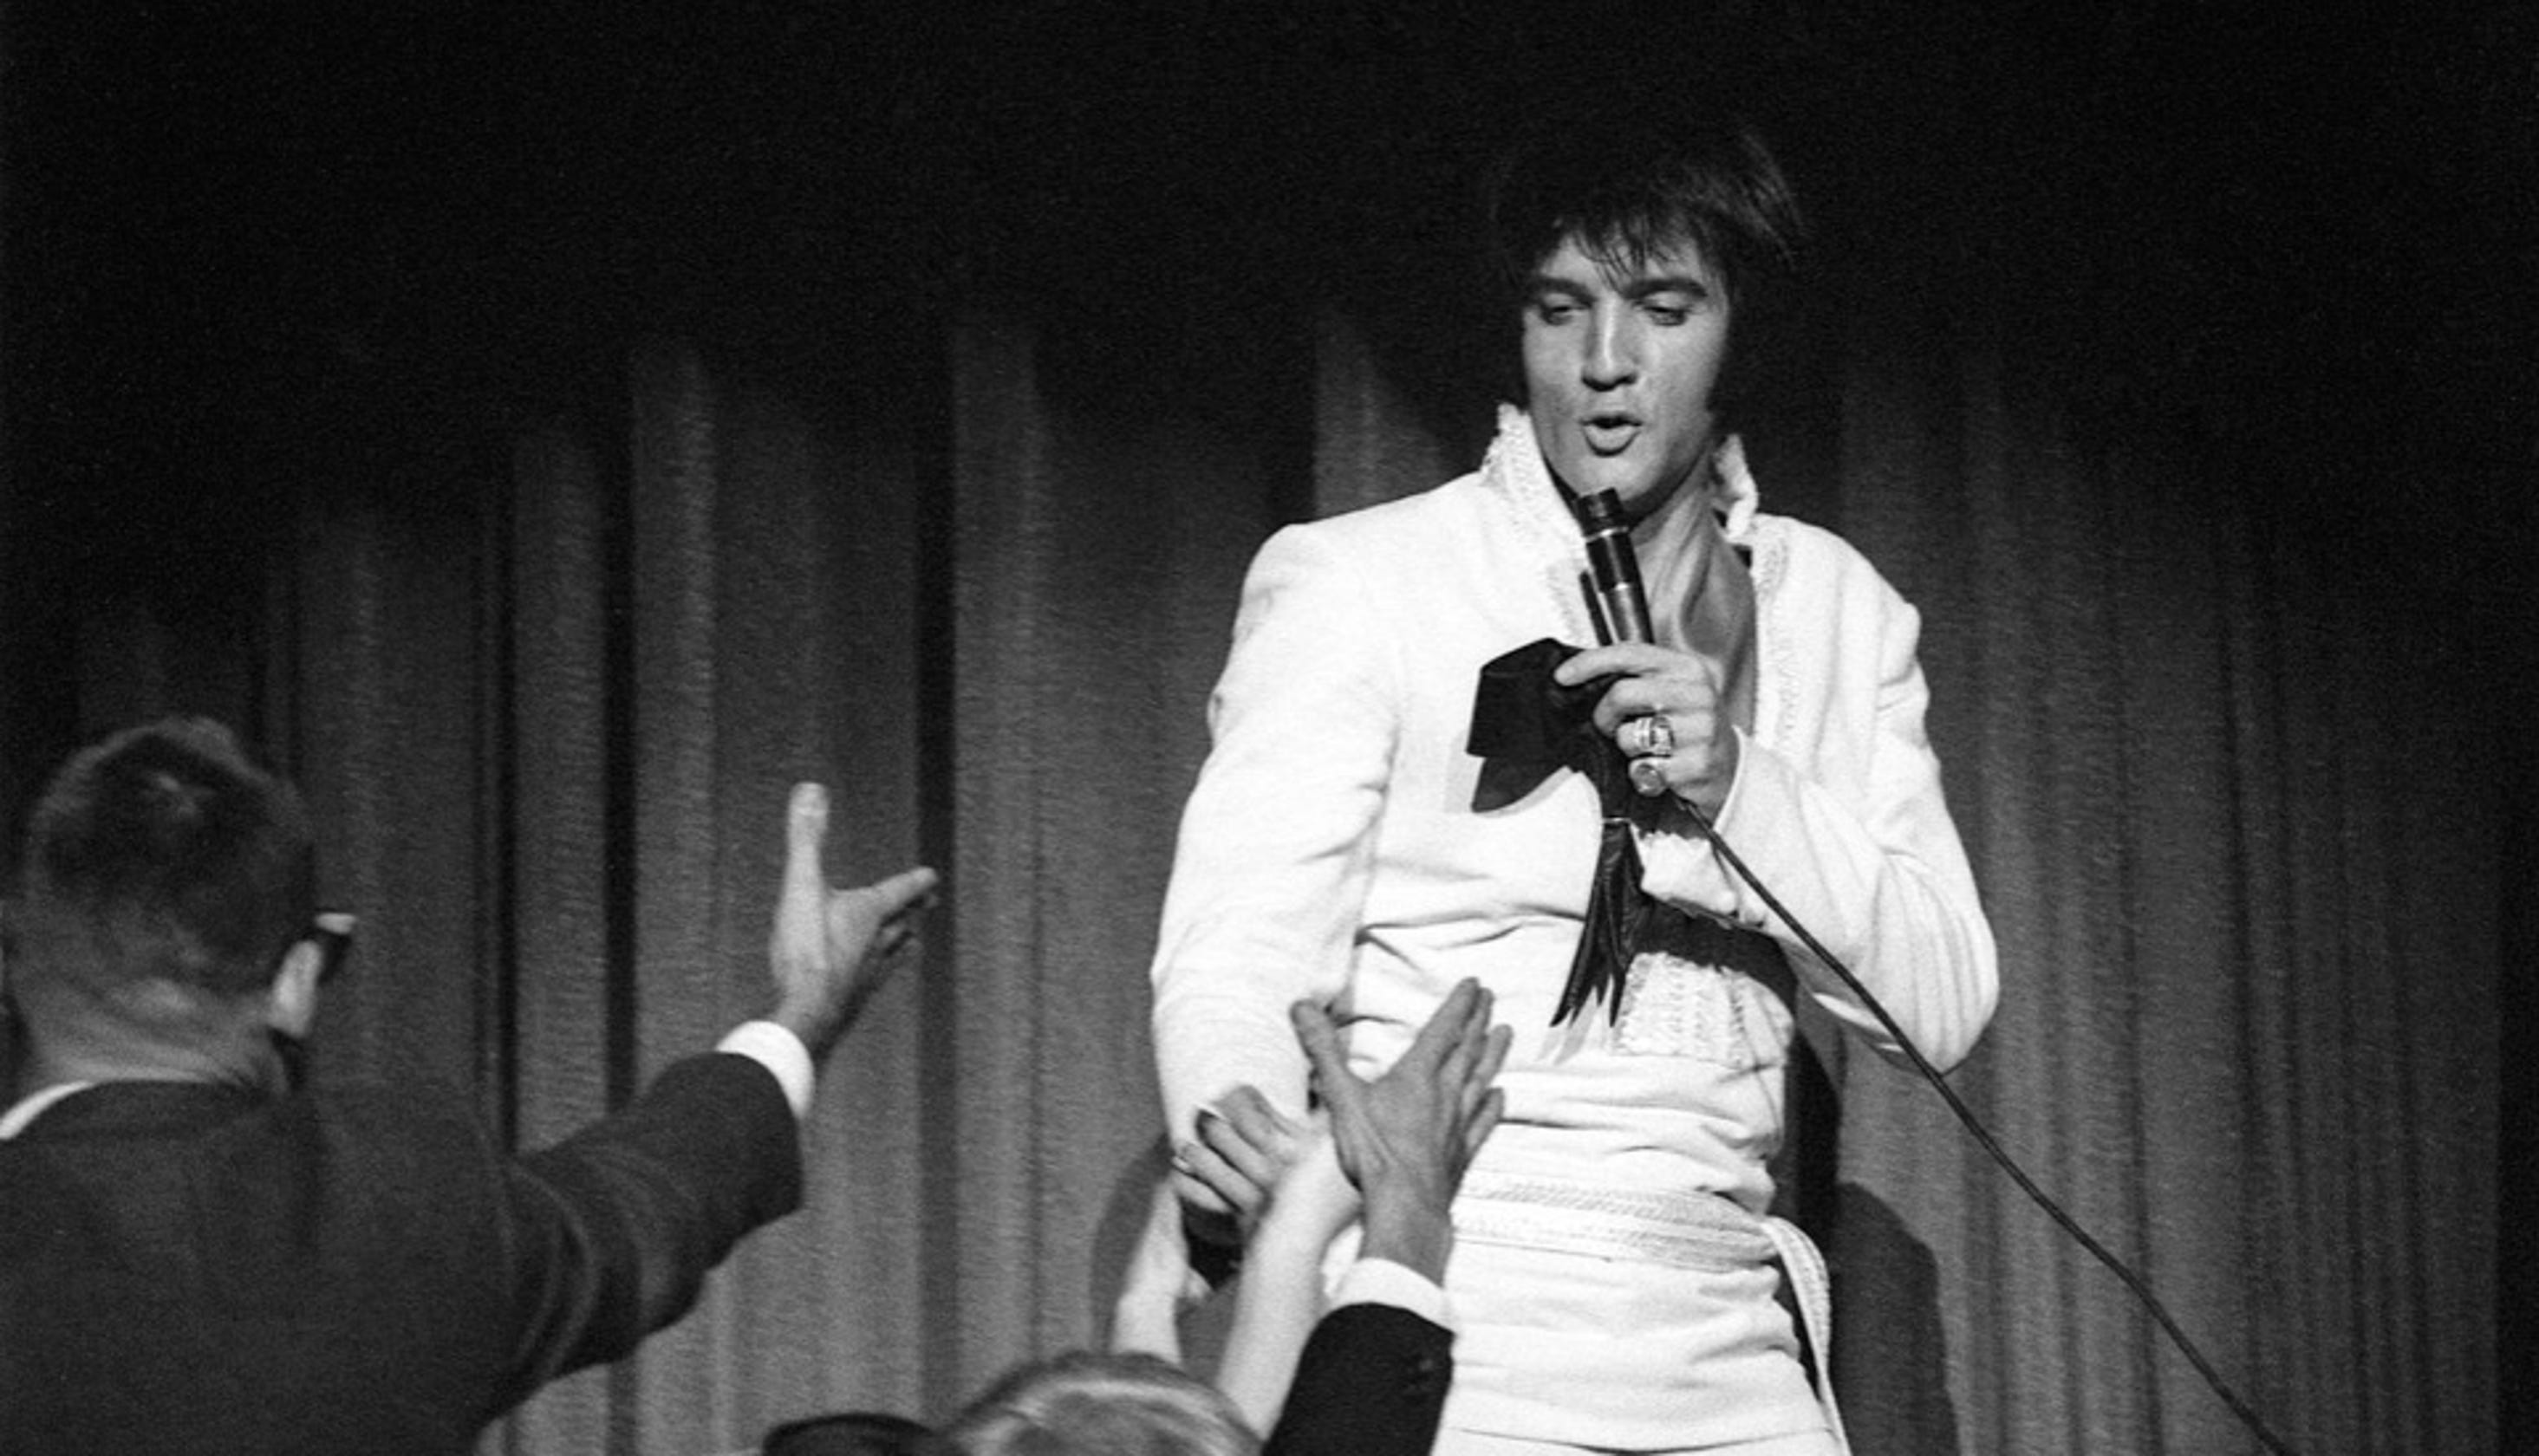 Elvis Presley: Box set, digital reissue celebrate King's triumphant 1969